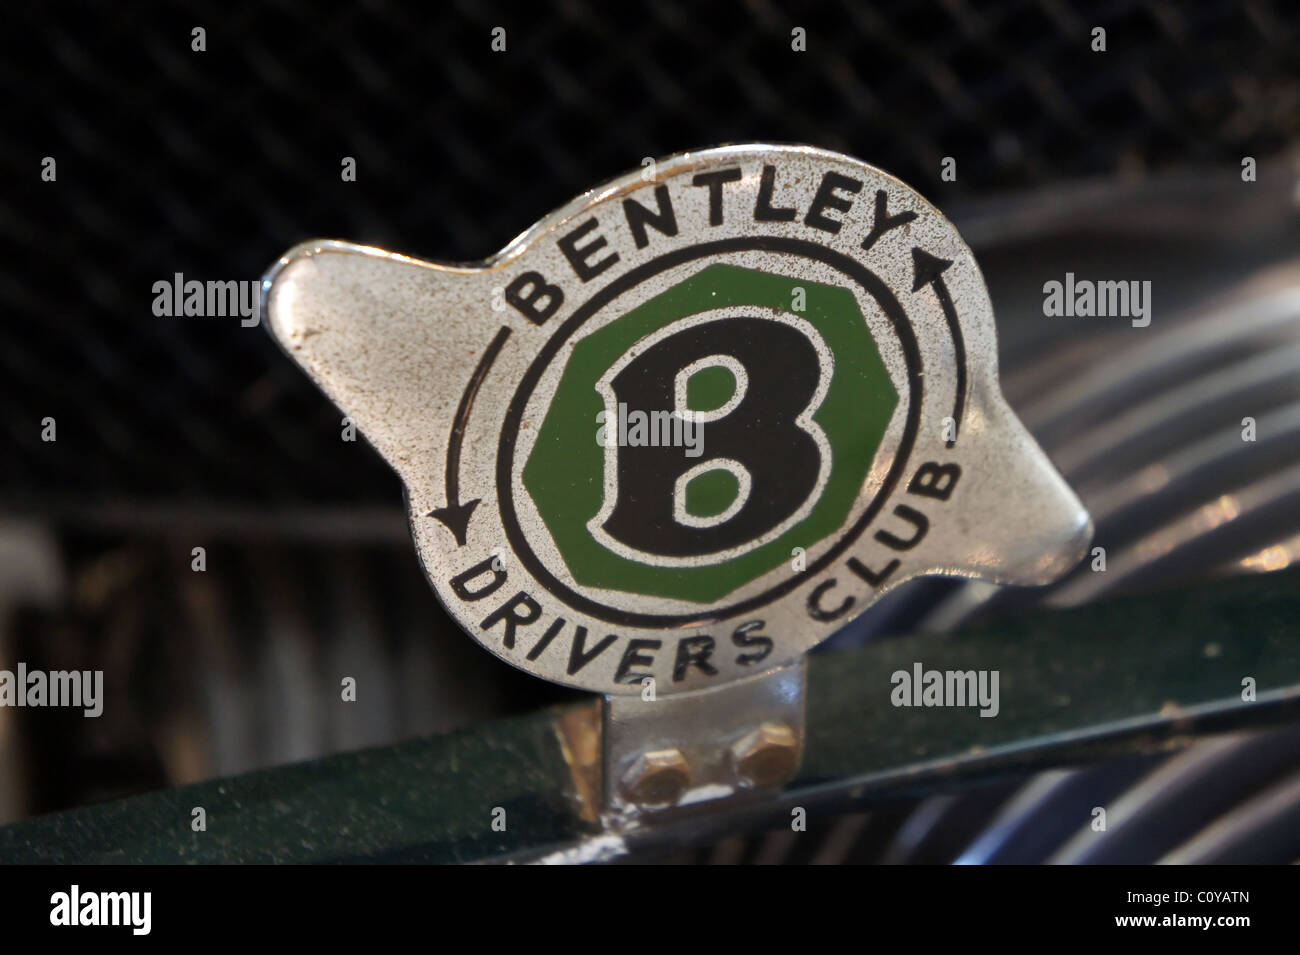 Bentley Drivers club badge - Stock Image